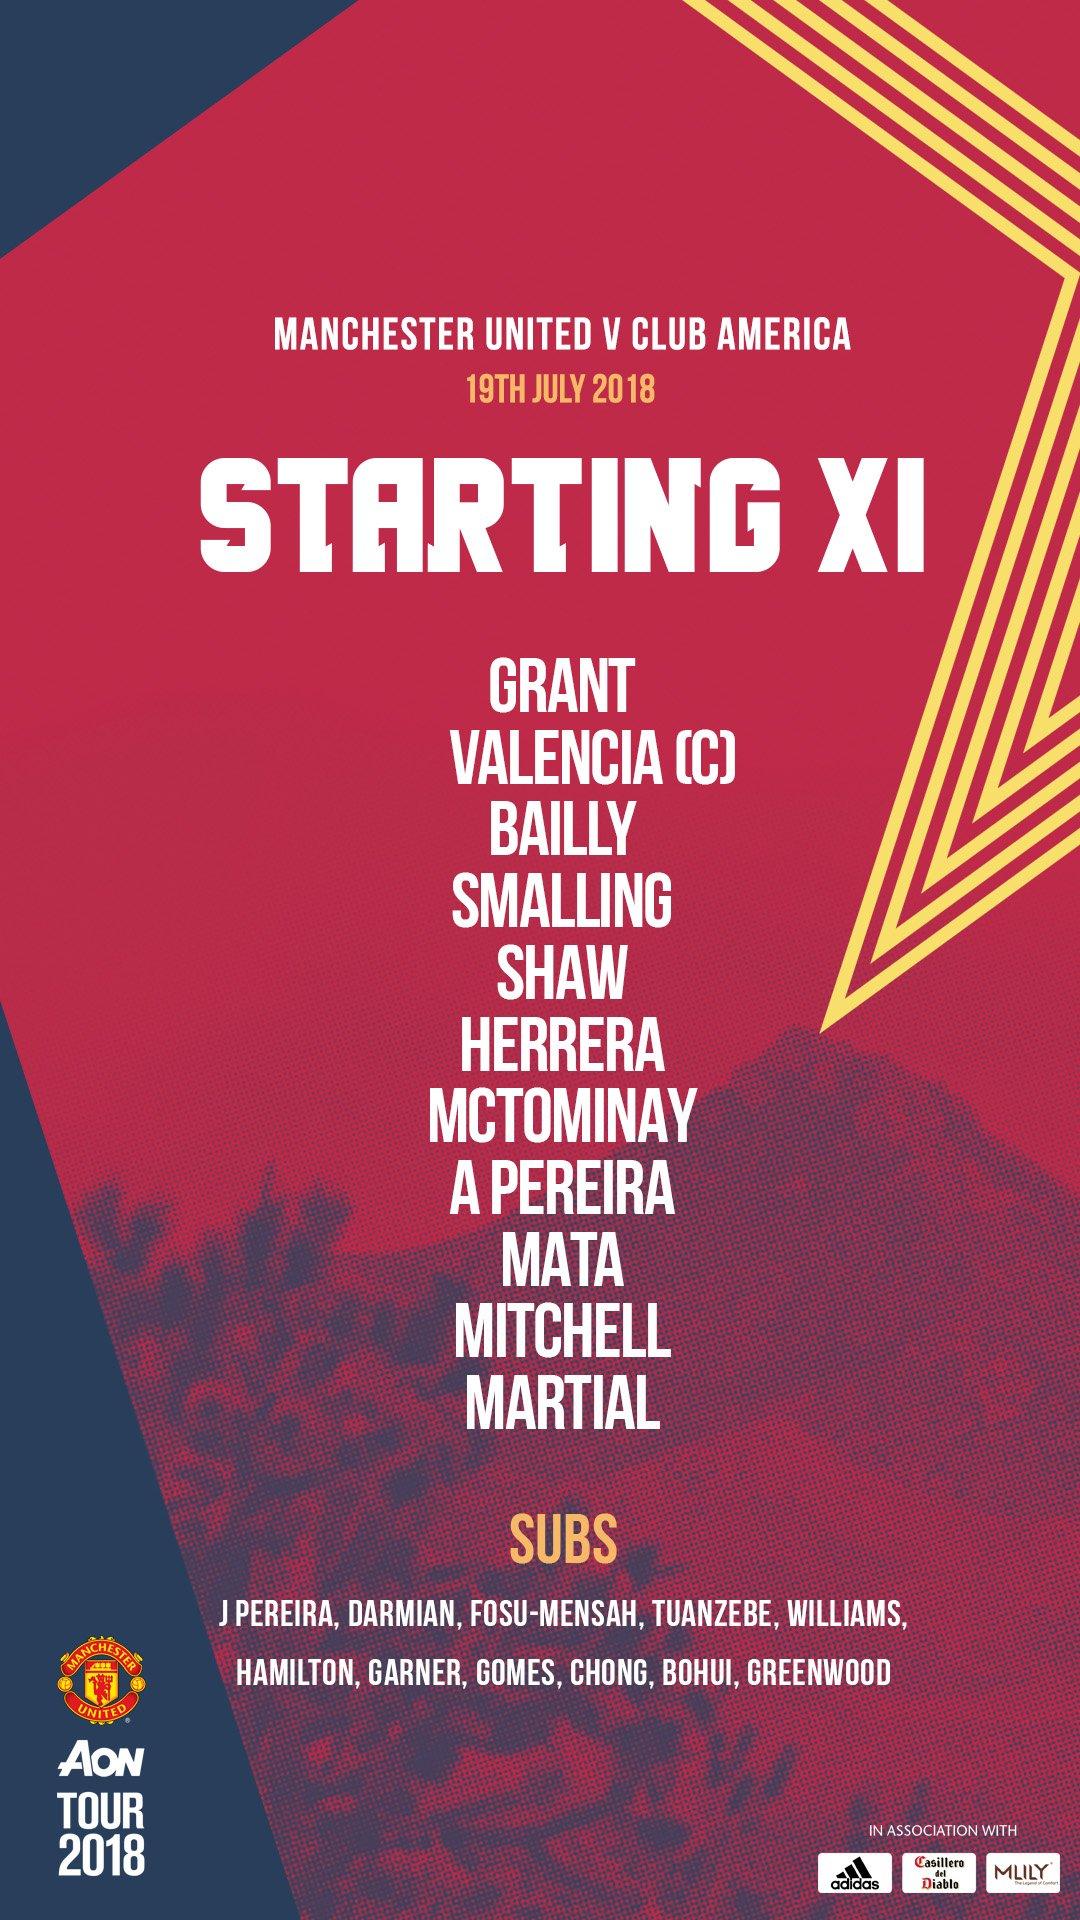 Starting XI vs Club America: Grant, Valencia, Bailly, Smalling, Shaw, Herrera, McTominay, Pereira, Mata, Mitchell, Martial